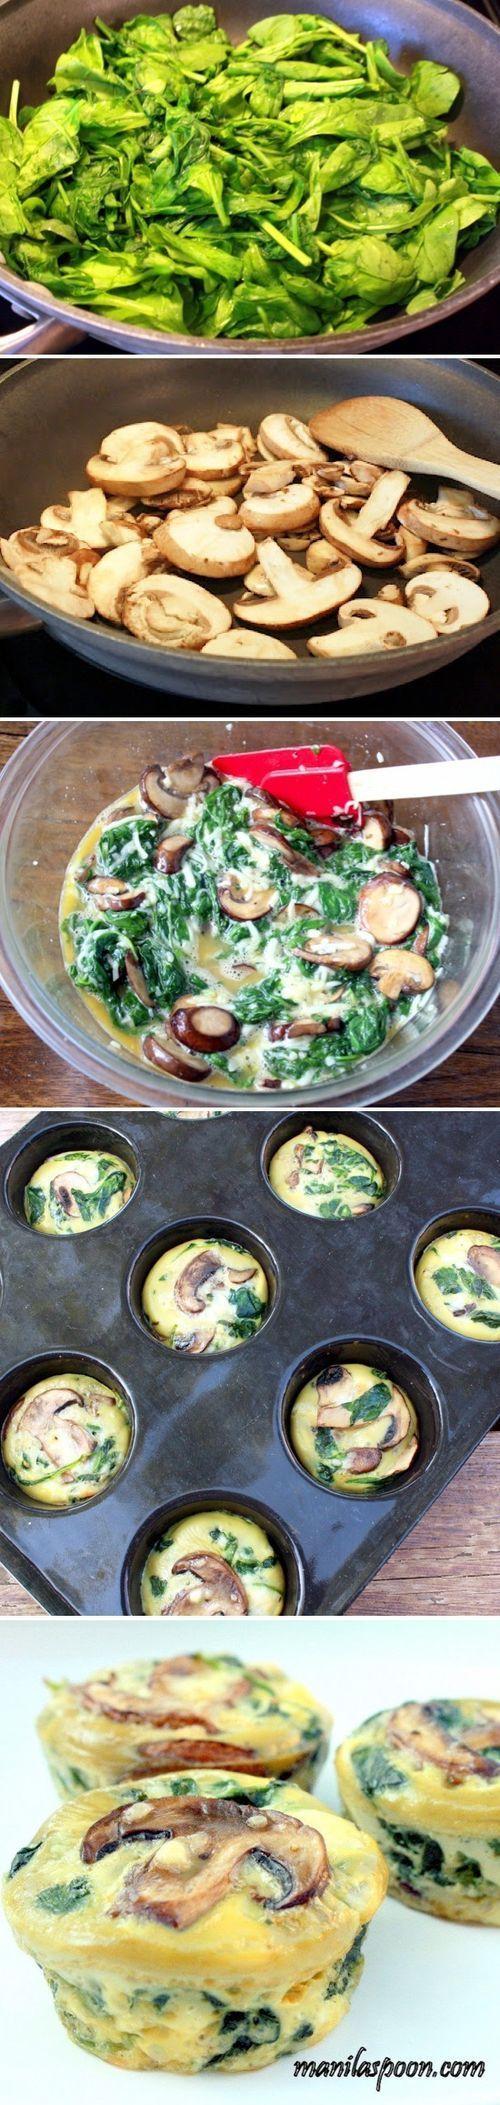 10 Egg Breakfast Ideas to Fuel Your Body   Freshly GrownFreshly Grown